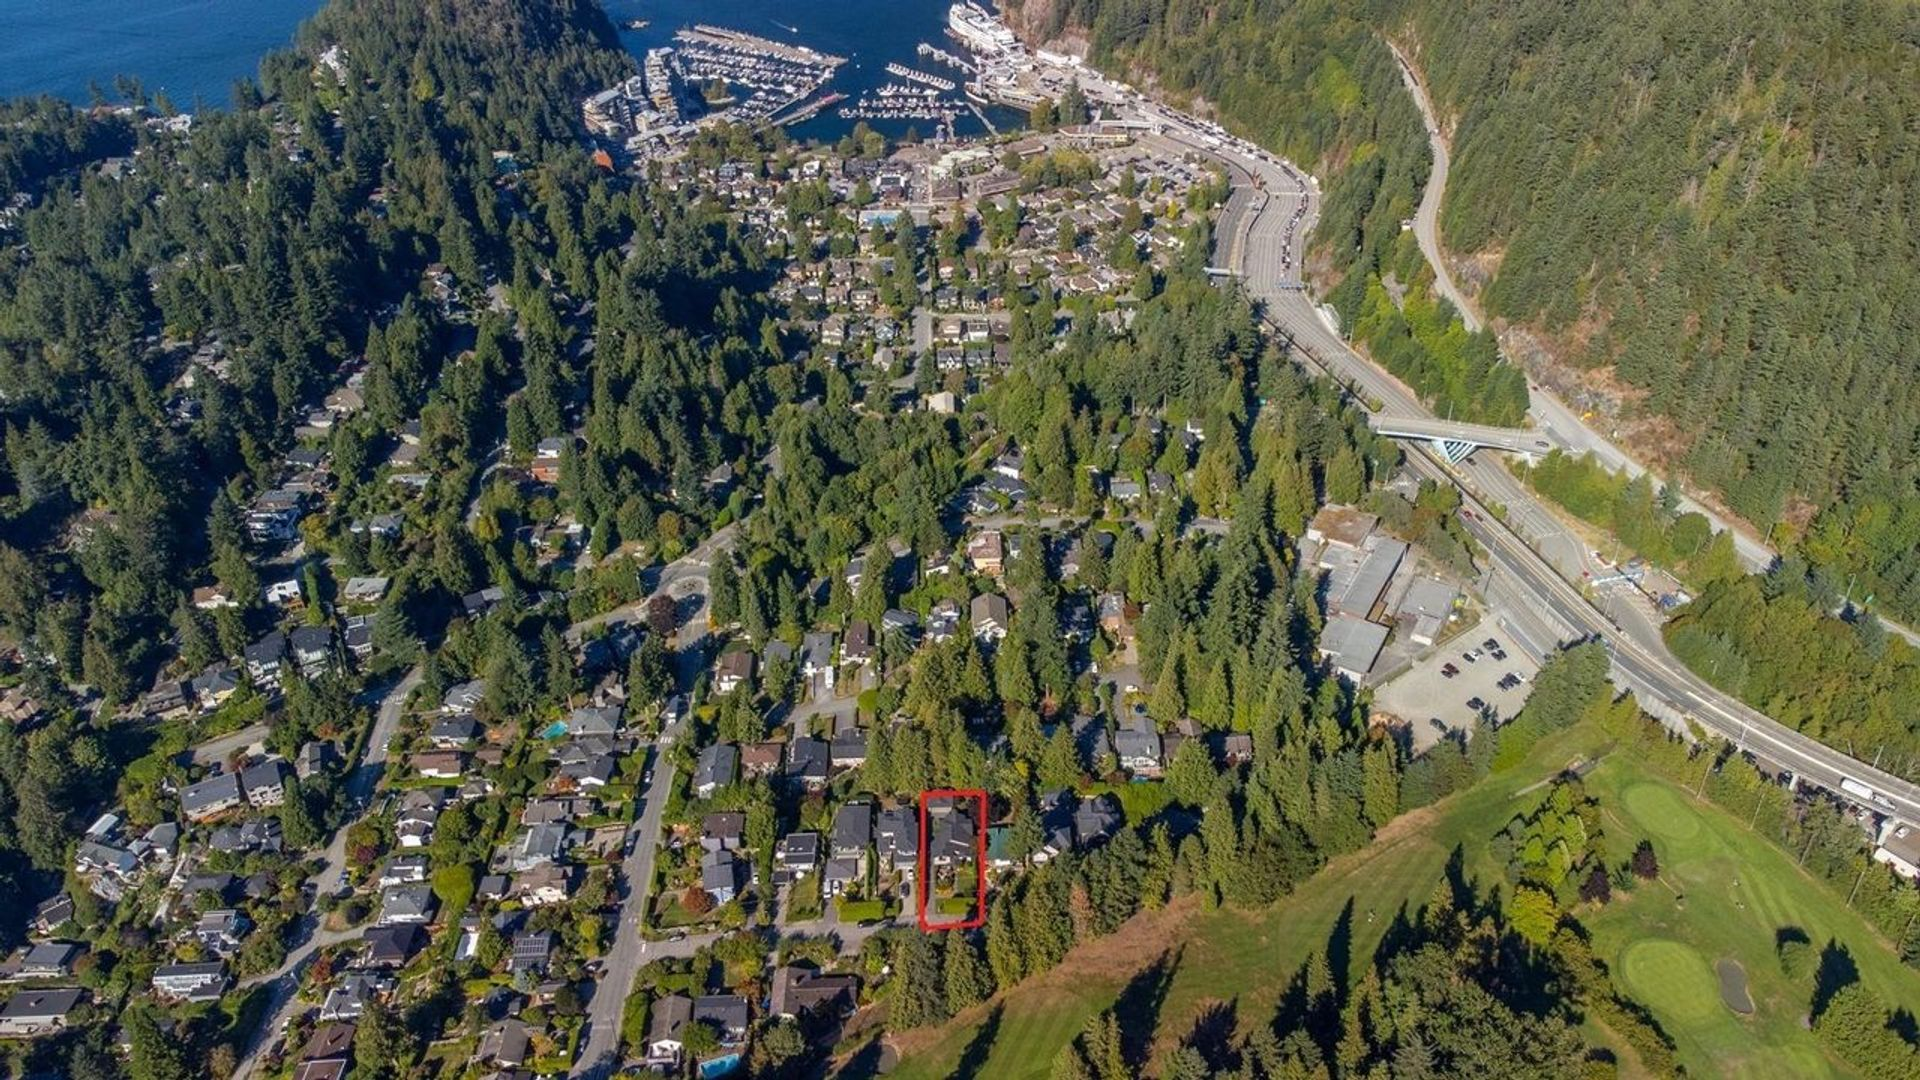 6447 Pitt Street, Gleneagles, West Vancouver - 6447-pitt-street-gleneagles-west-vancouver-40